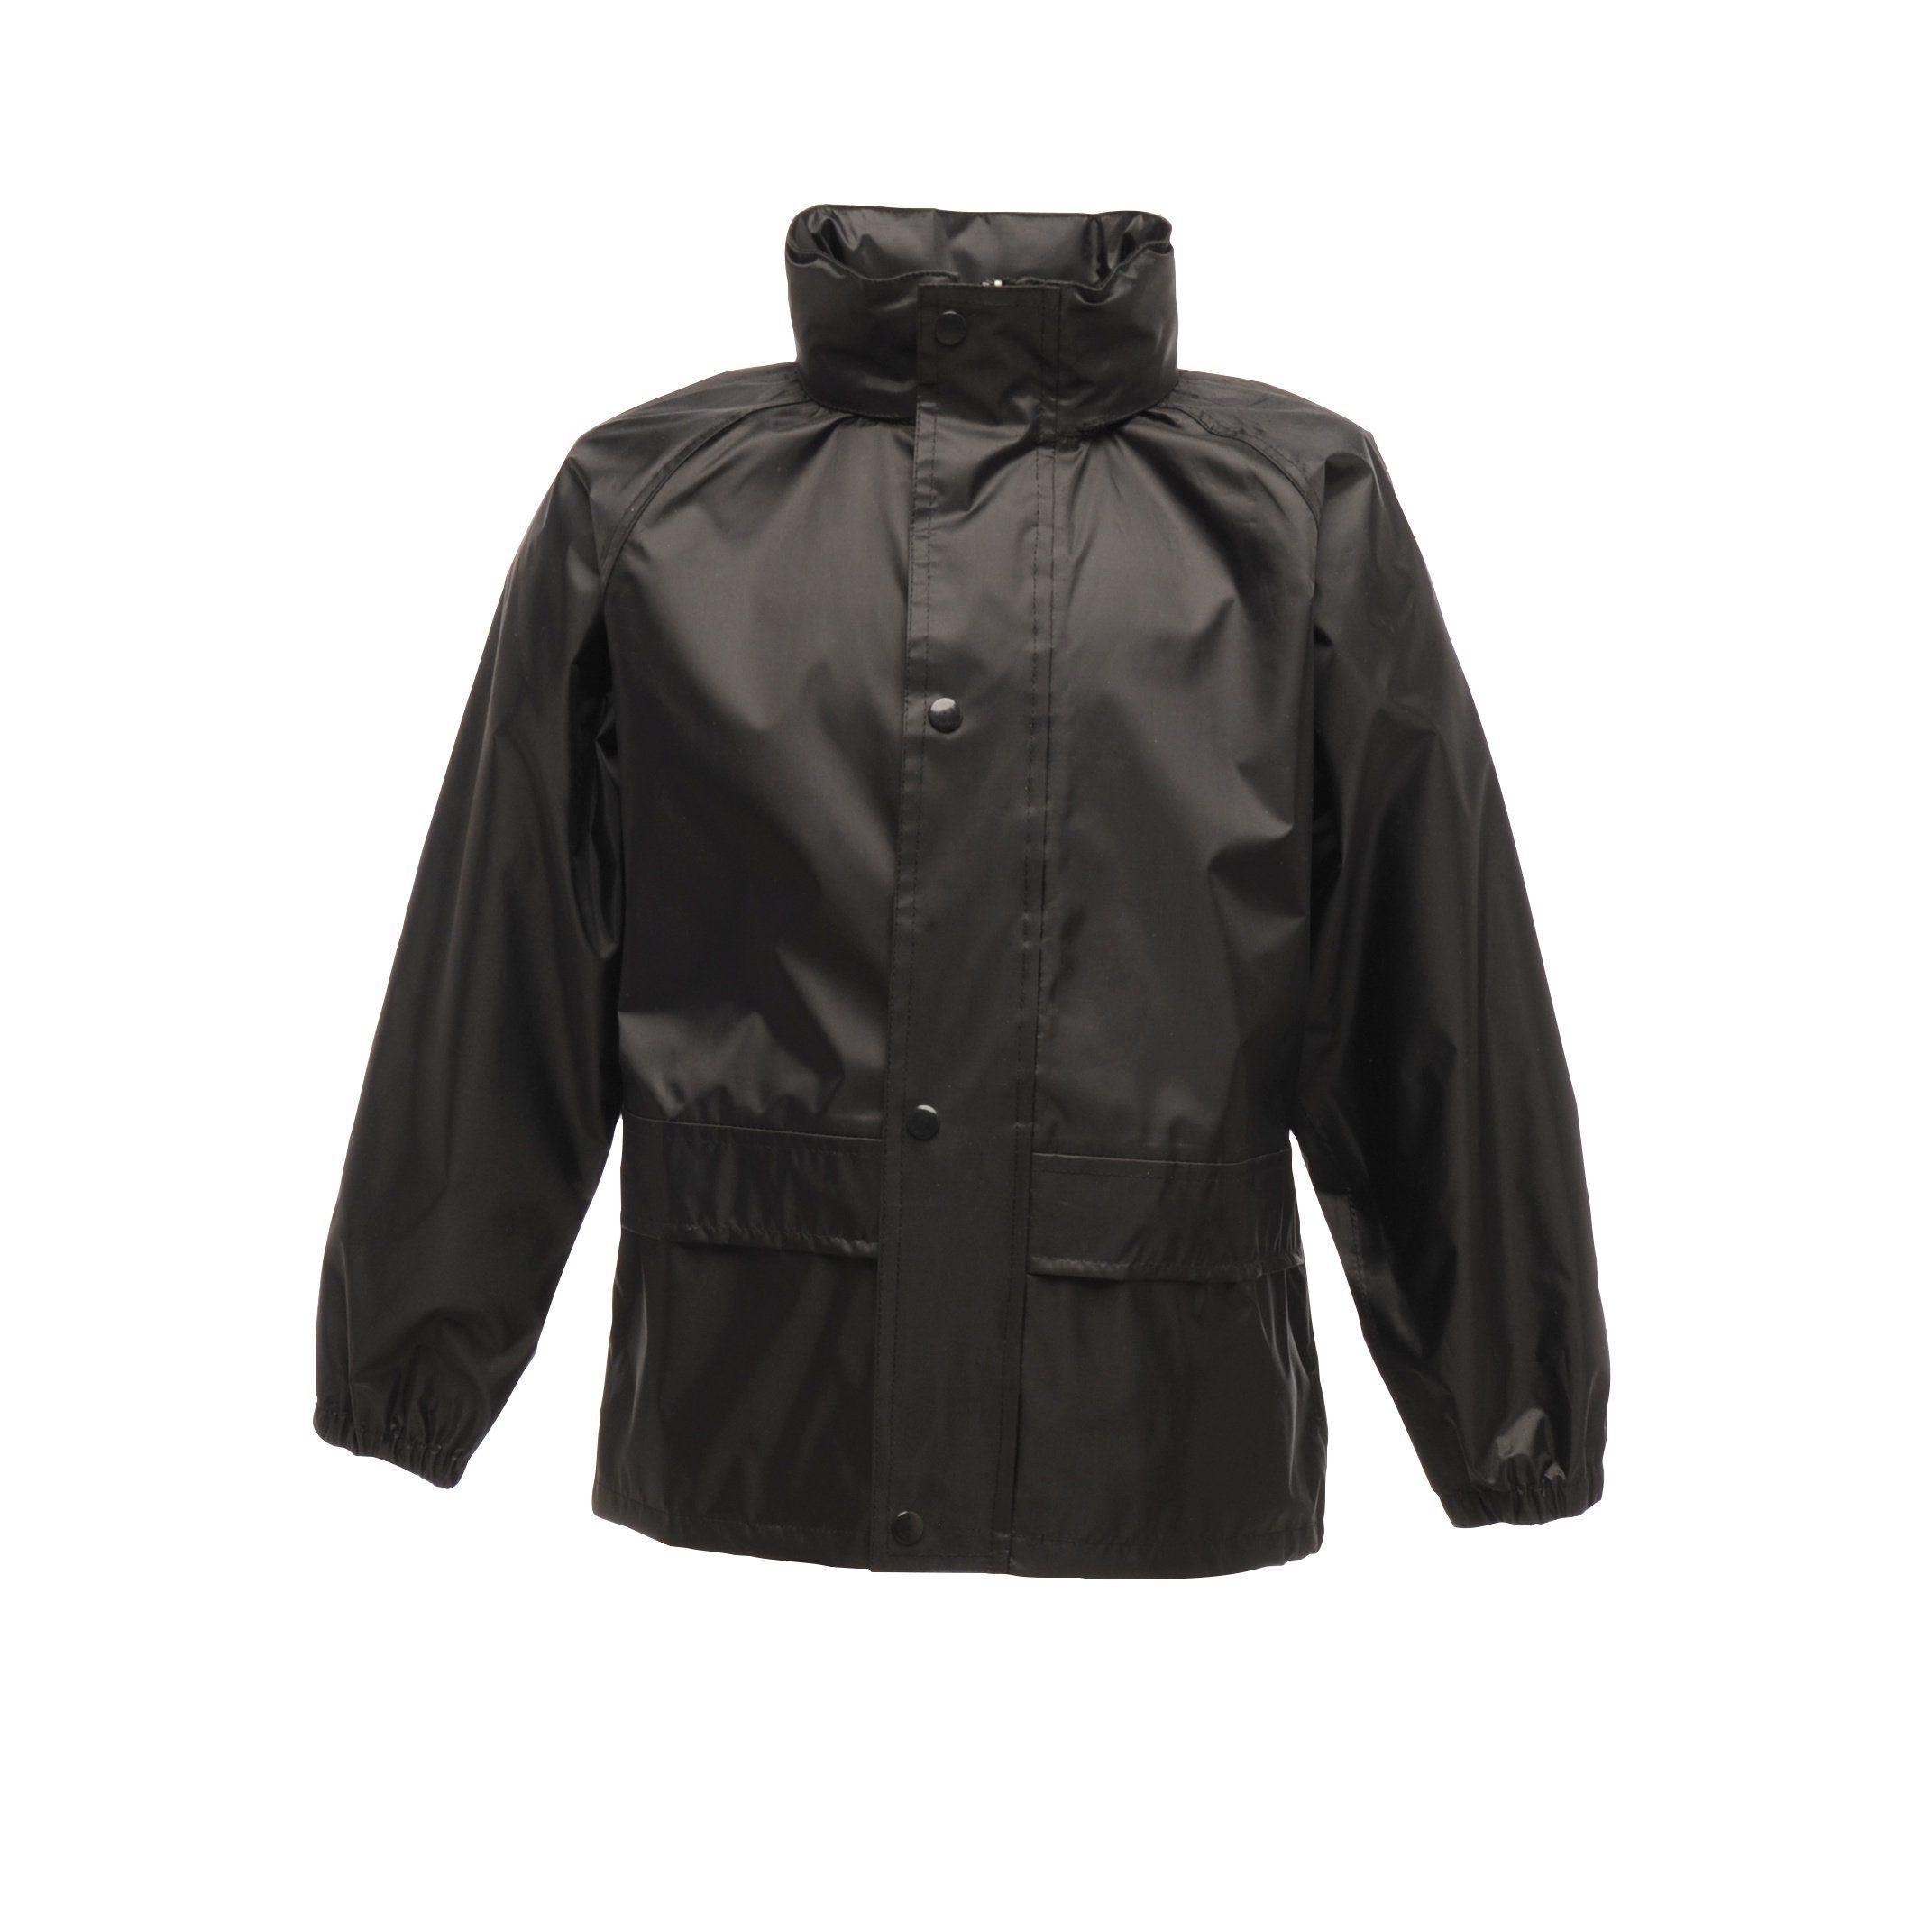 Mountain Warehouse Kids Rain Suit Waterproof Taped Seams /& Elasticated Cuffs